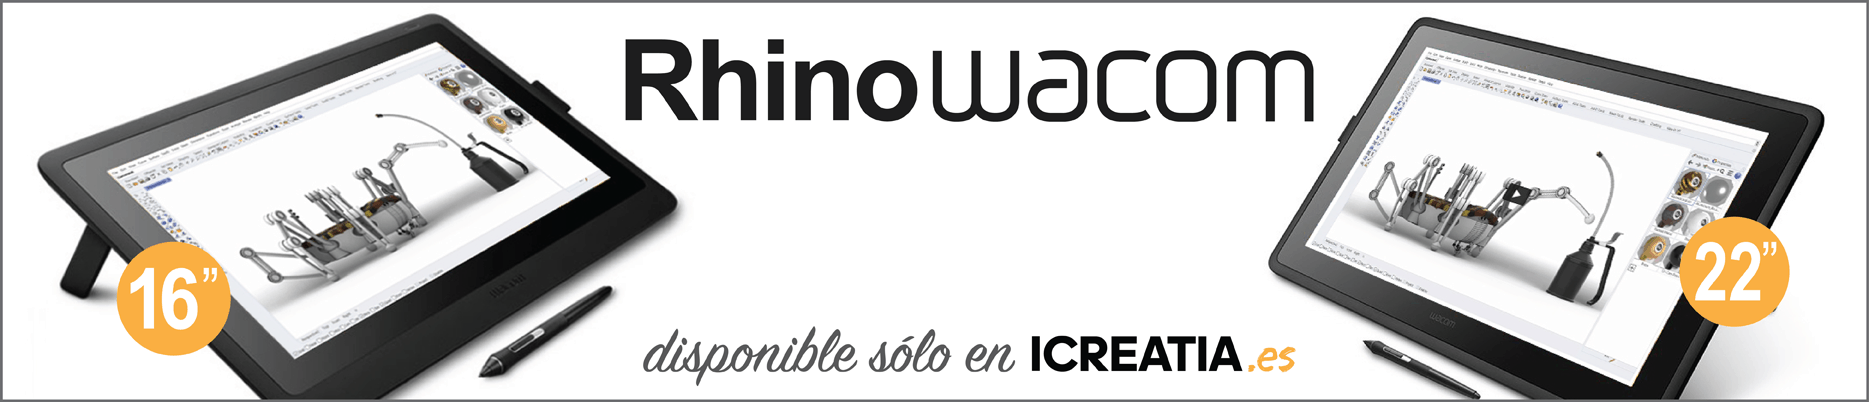 RhinoWacom